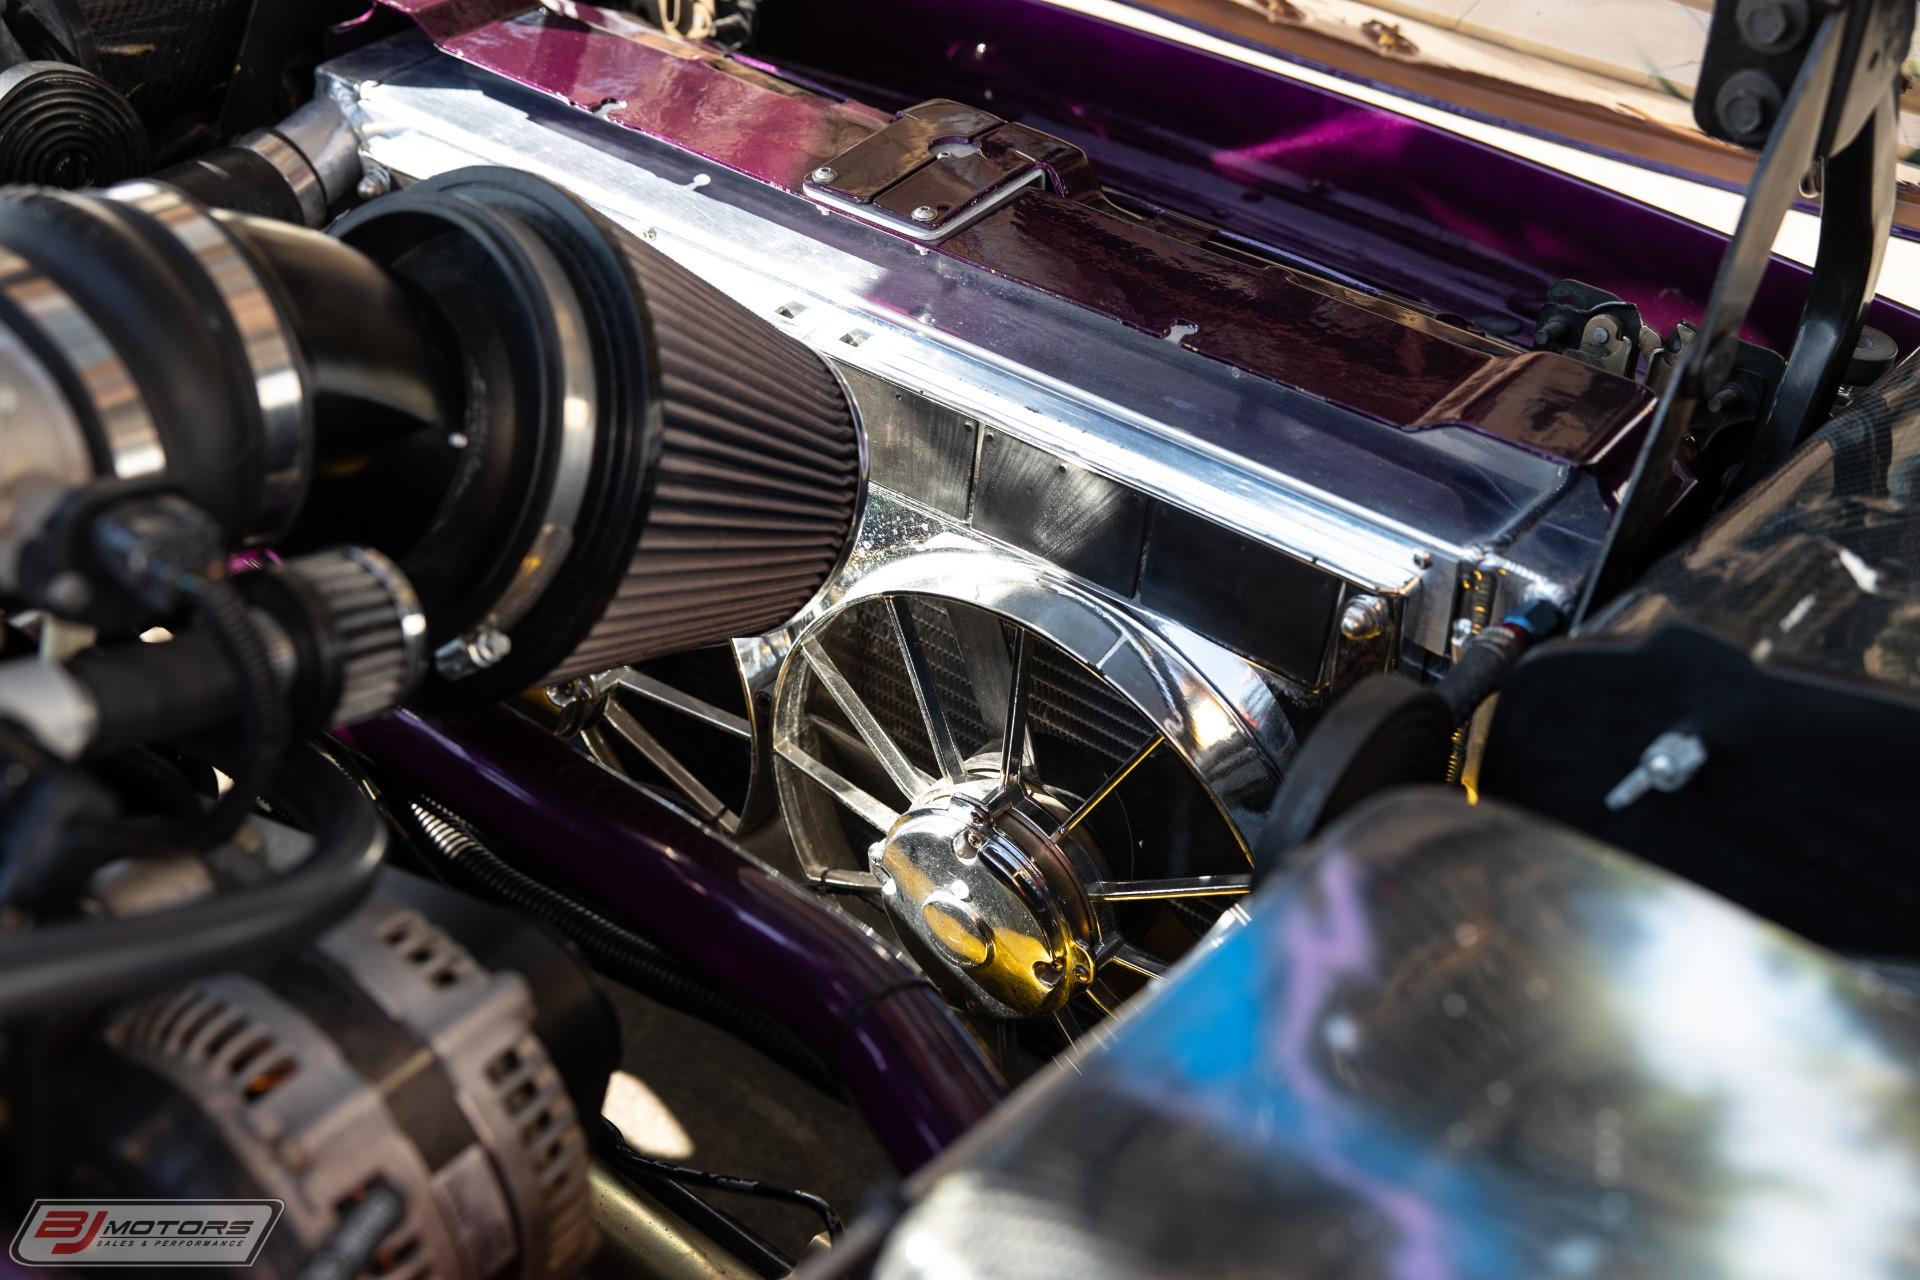 Used-2001-Dodge-Viper-GTS-Custom-Show-Car